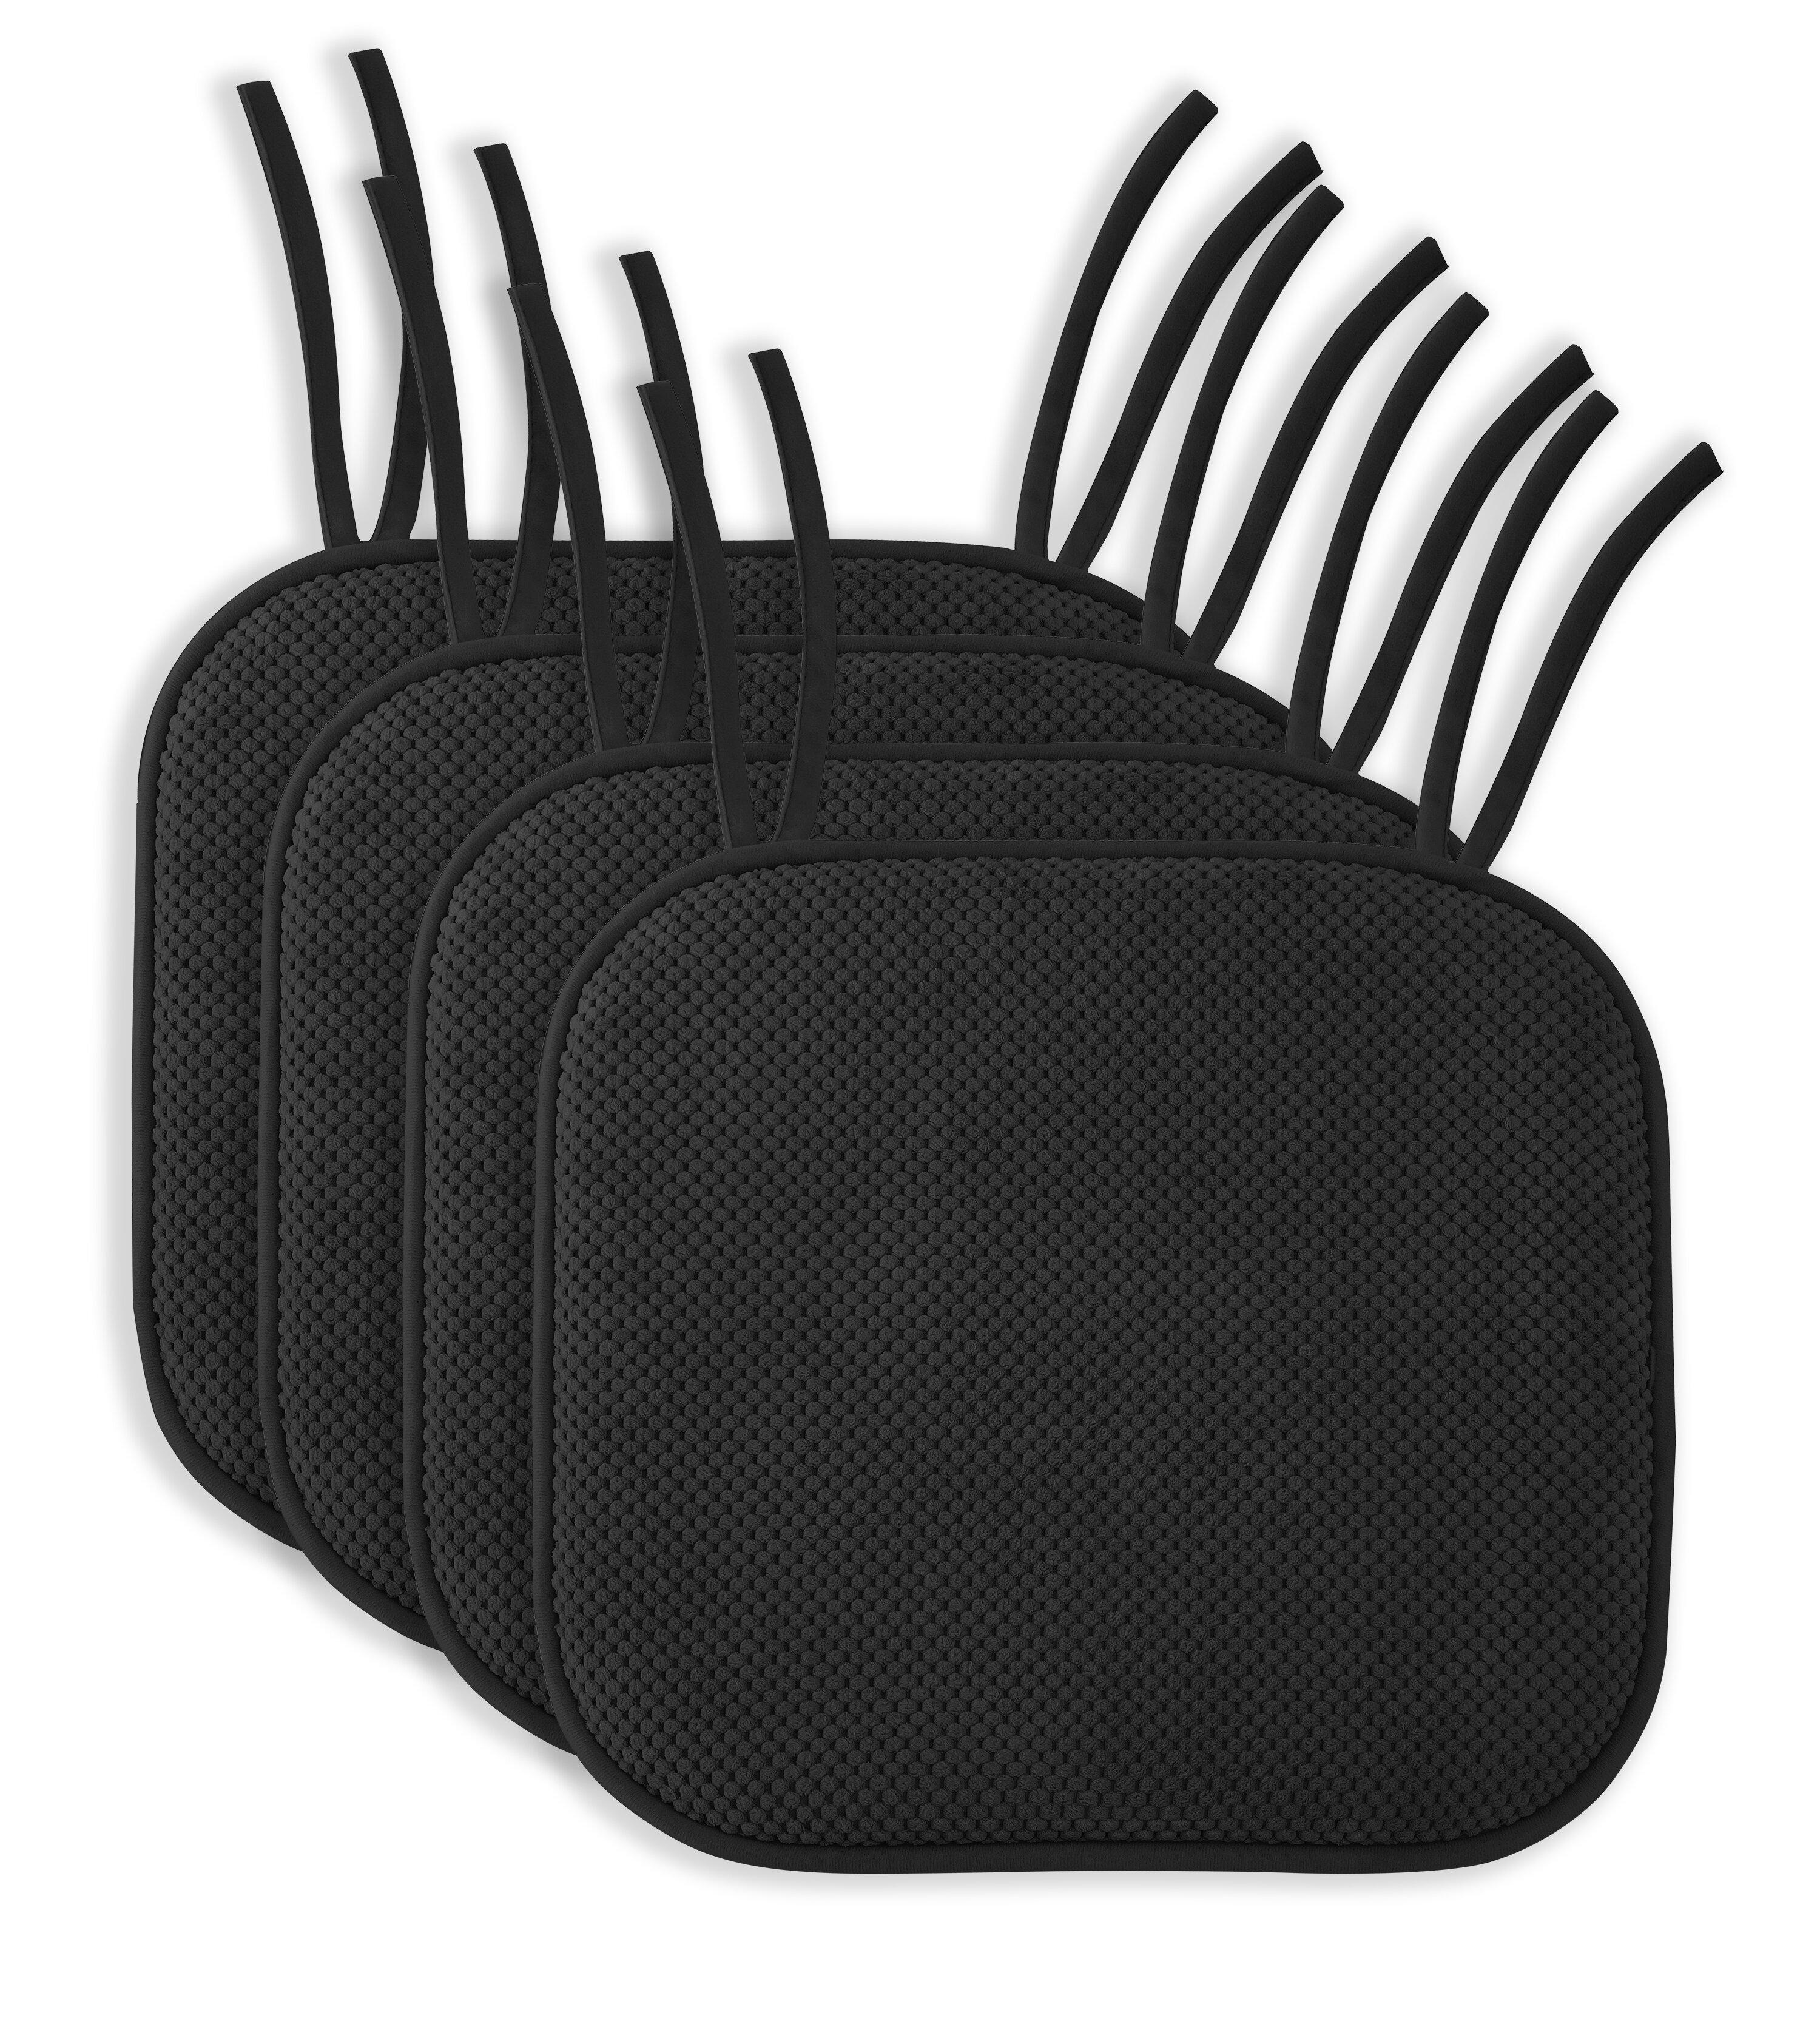 Symple Stuff Non Slip Memory Foam Indoor Dining Chair Cushion Reviews Wayfair